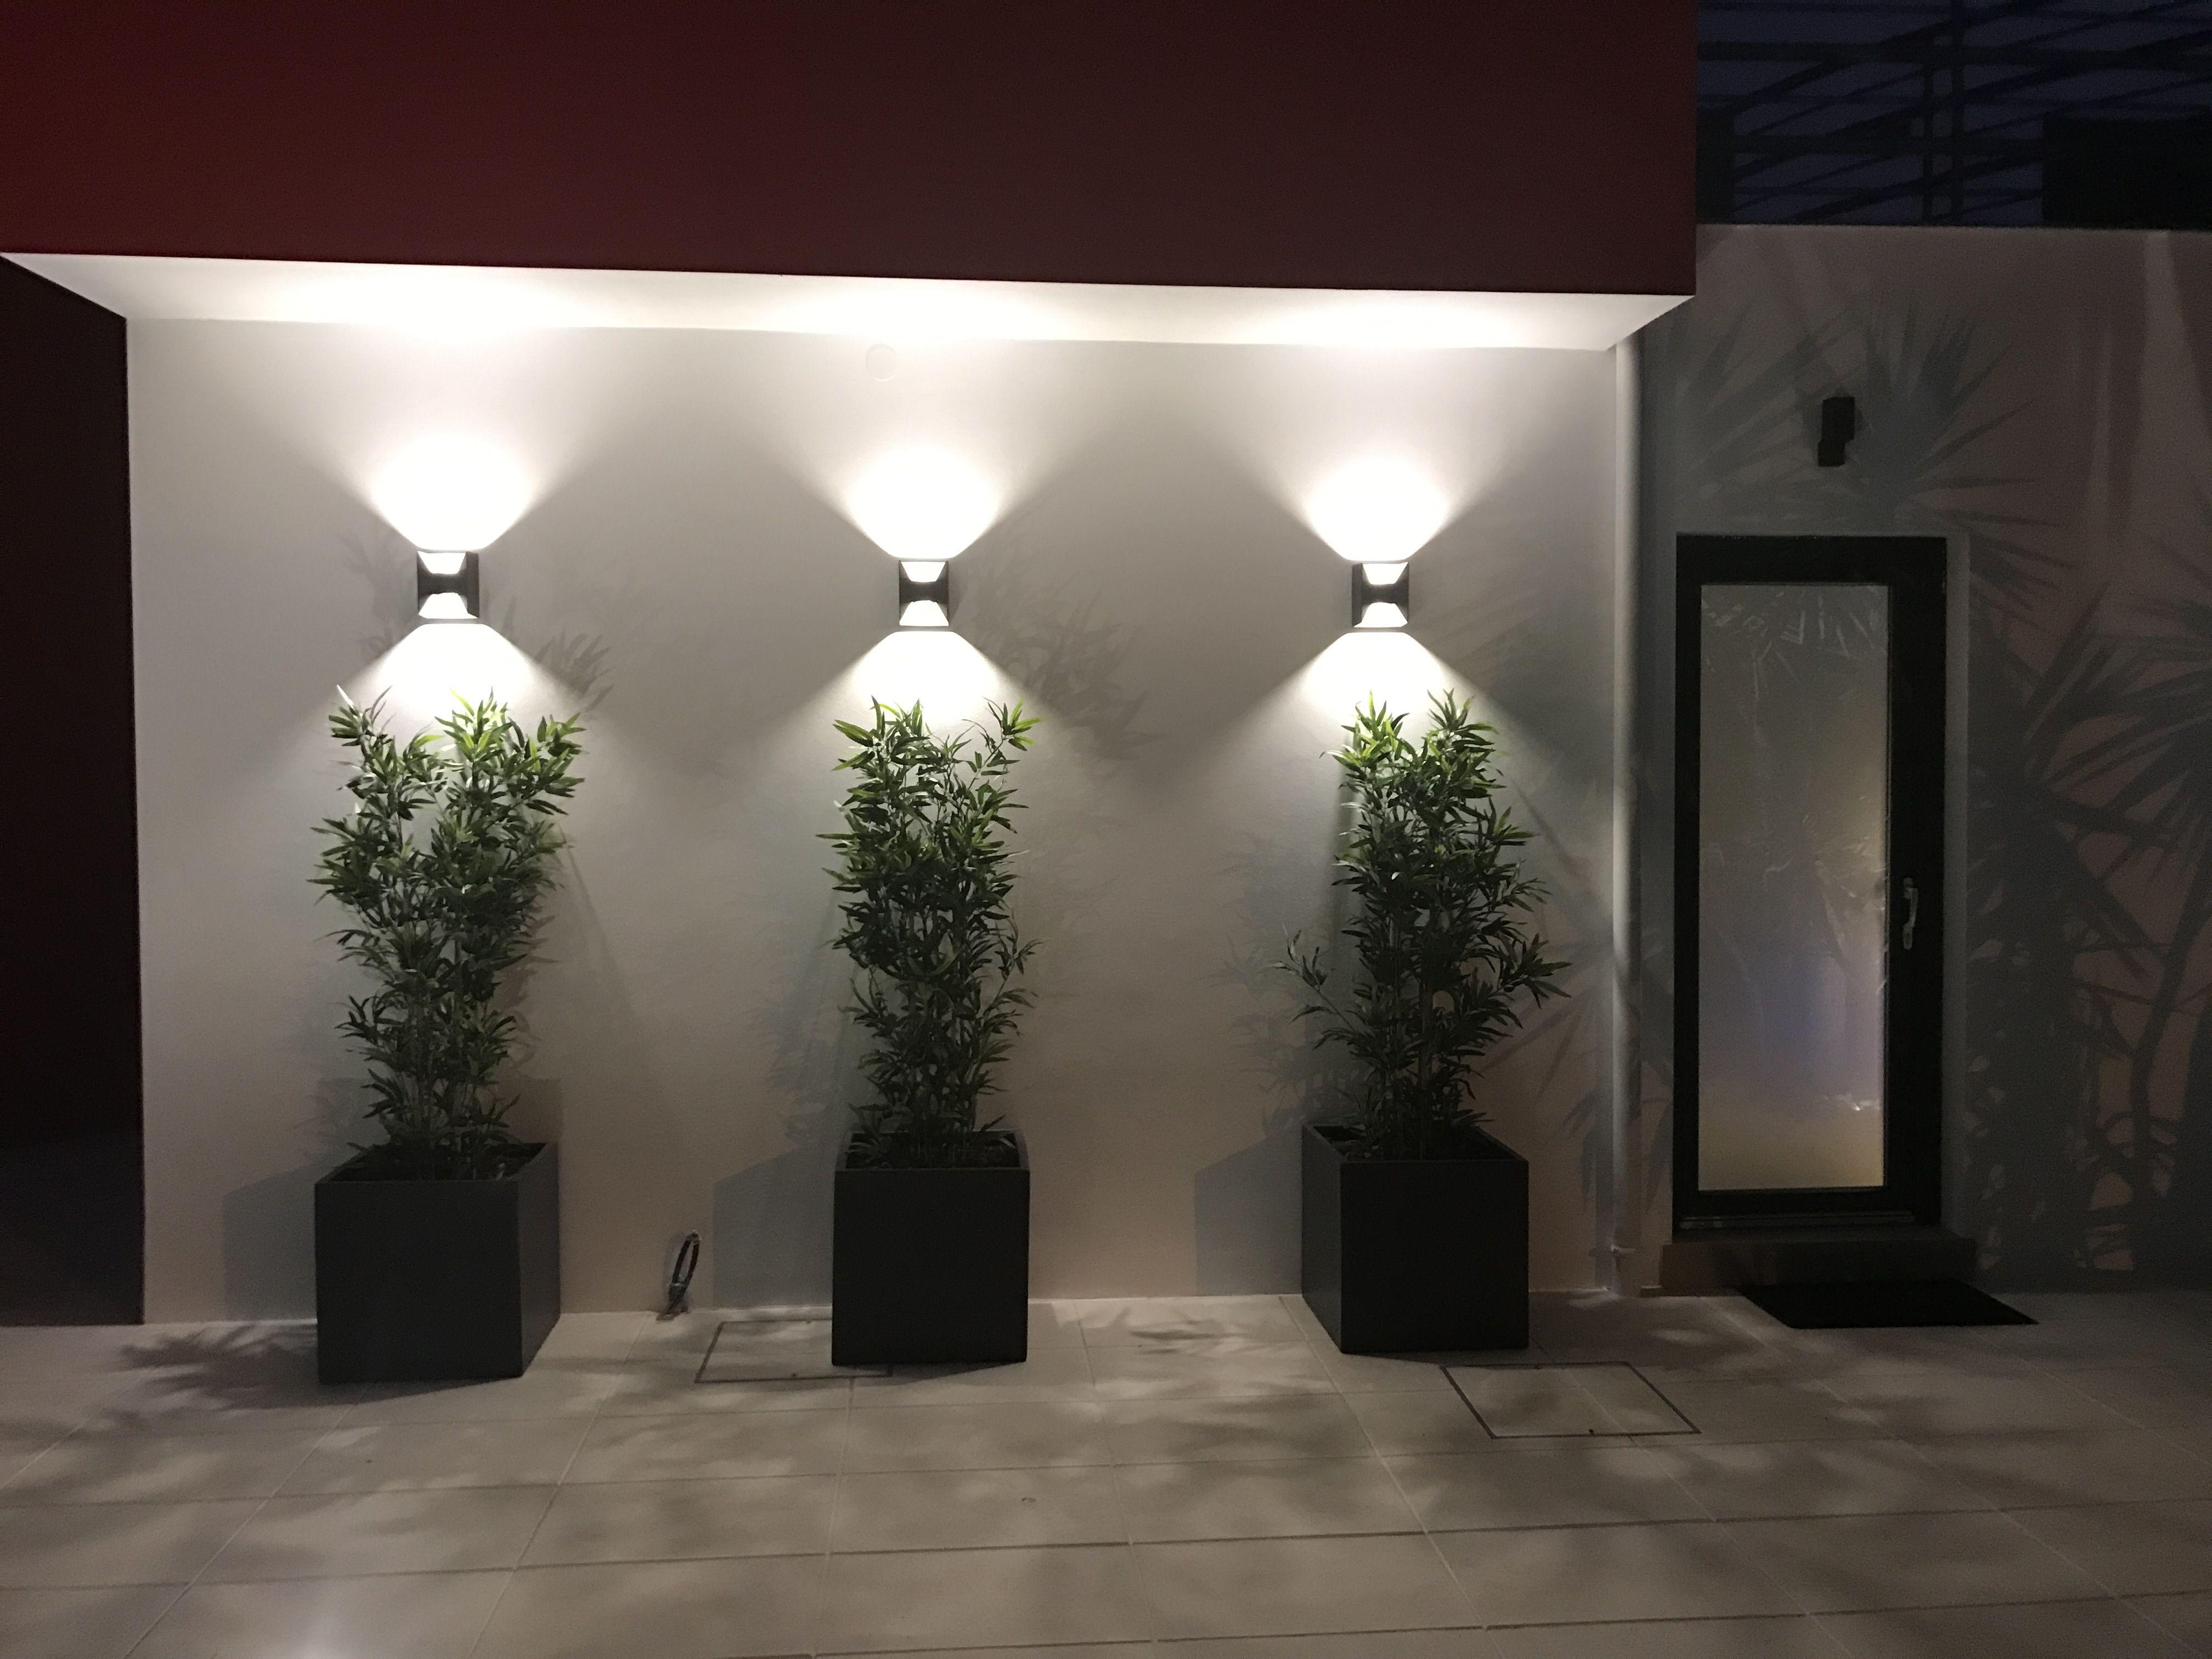 Ideia Boa Exterior Wall Design Landscape Lighting Design Wall Design